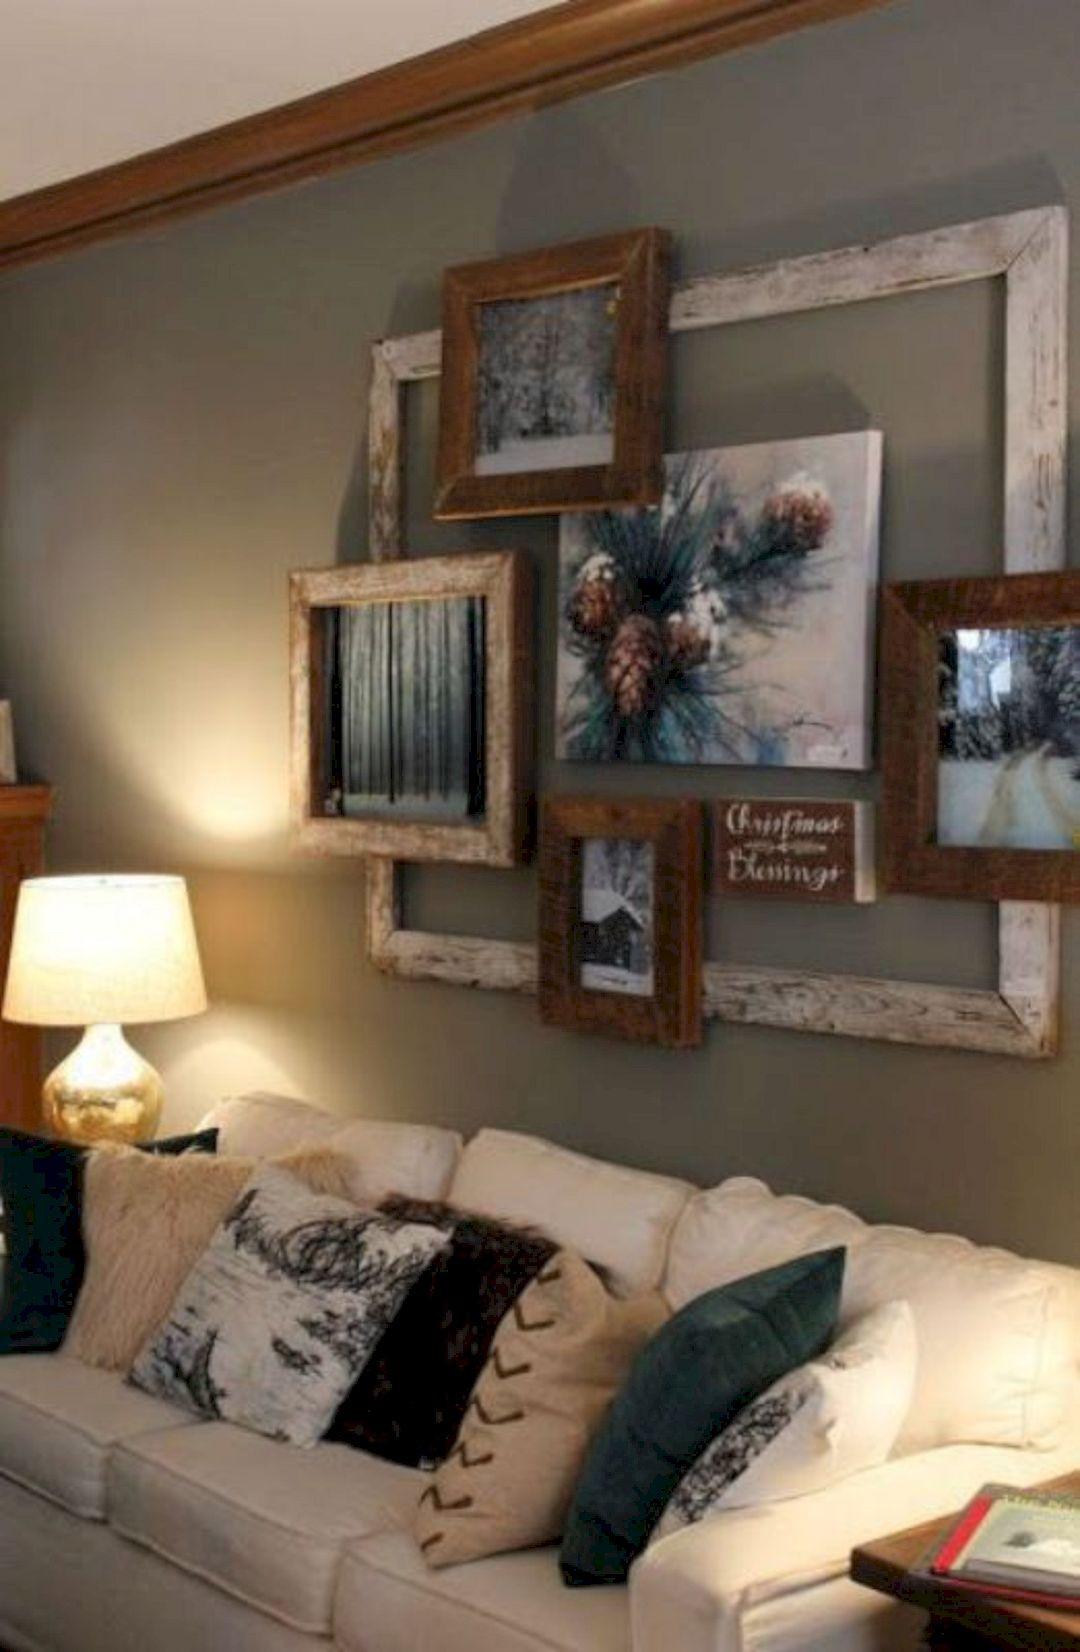 DIY Decor Ideas For Living Room  17 DIY Rustic Home Decor Ideas for Living Room – Futurist